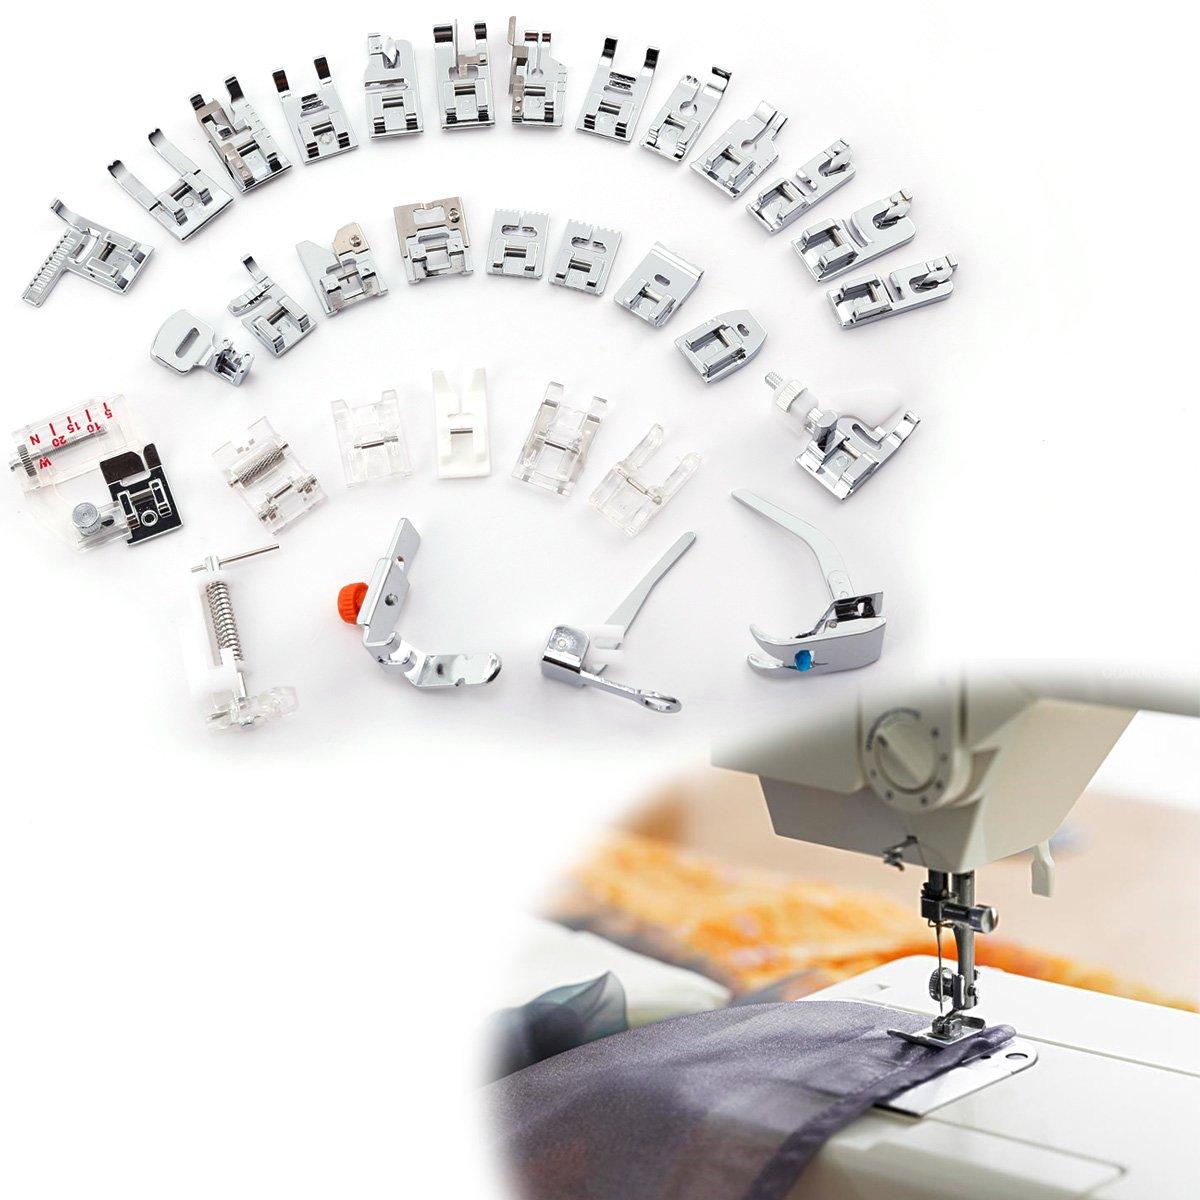 SurePromise One Stop Solution for Sourcing 32 Piezas palanqueta Multifuncional para máquina de Coser domistique # 650: Amazon.es: Hogar